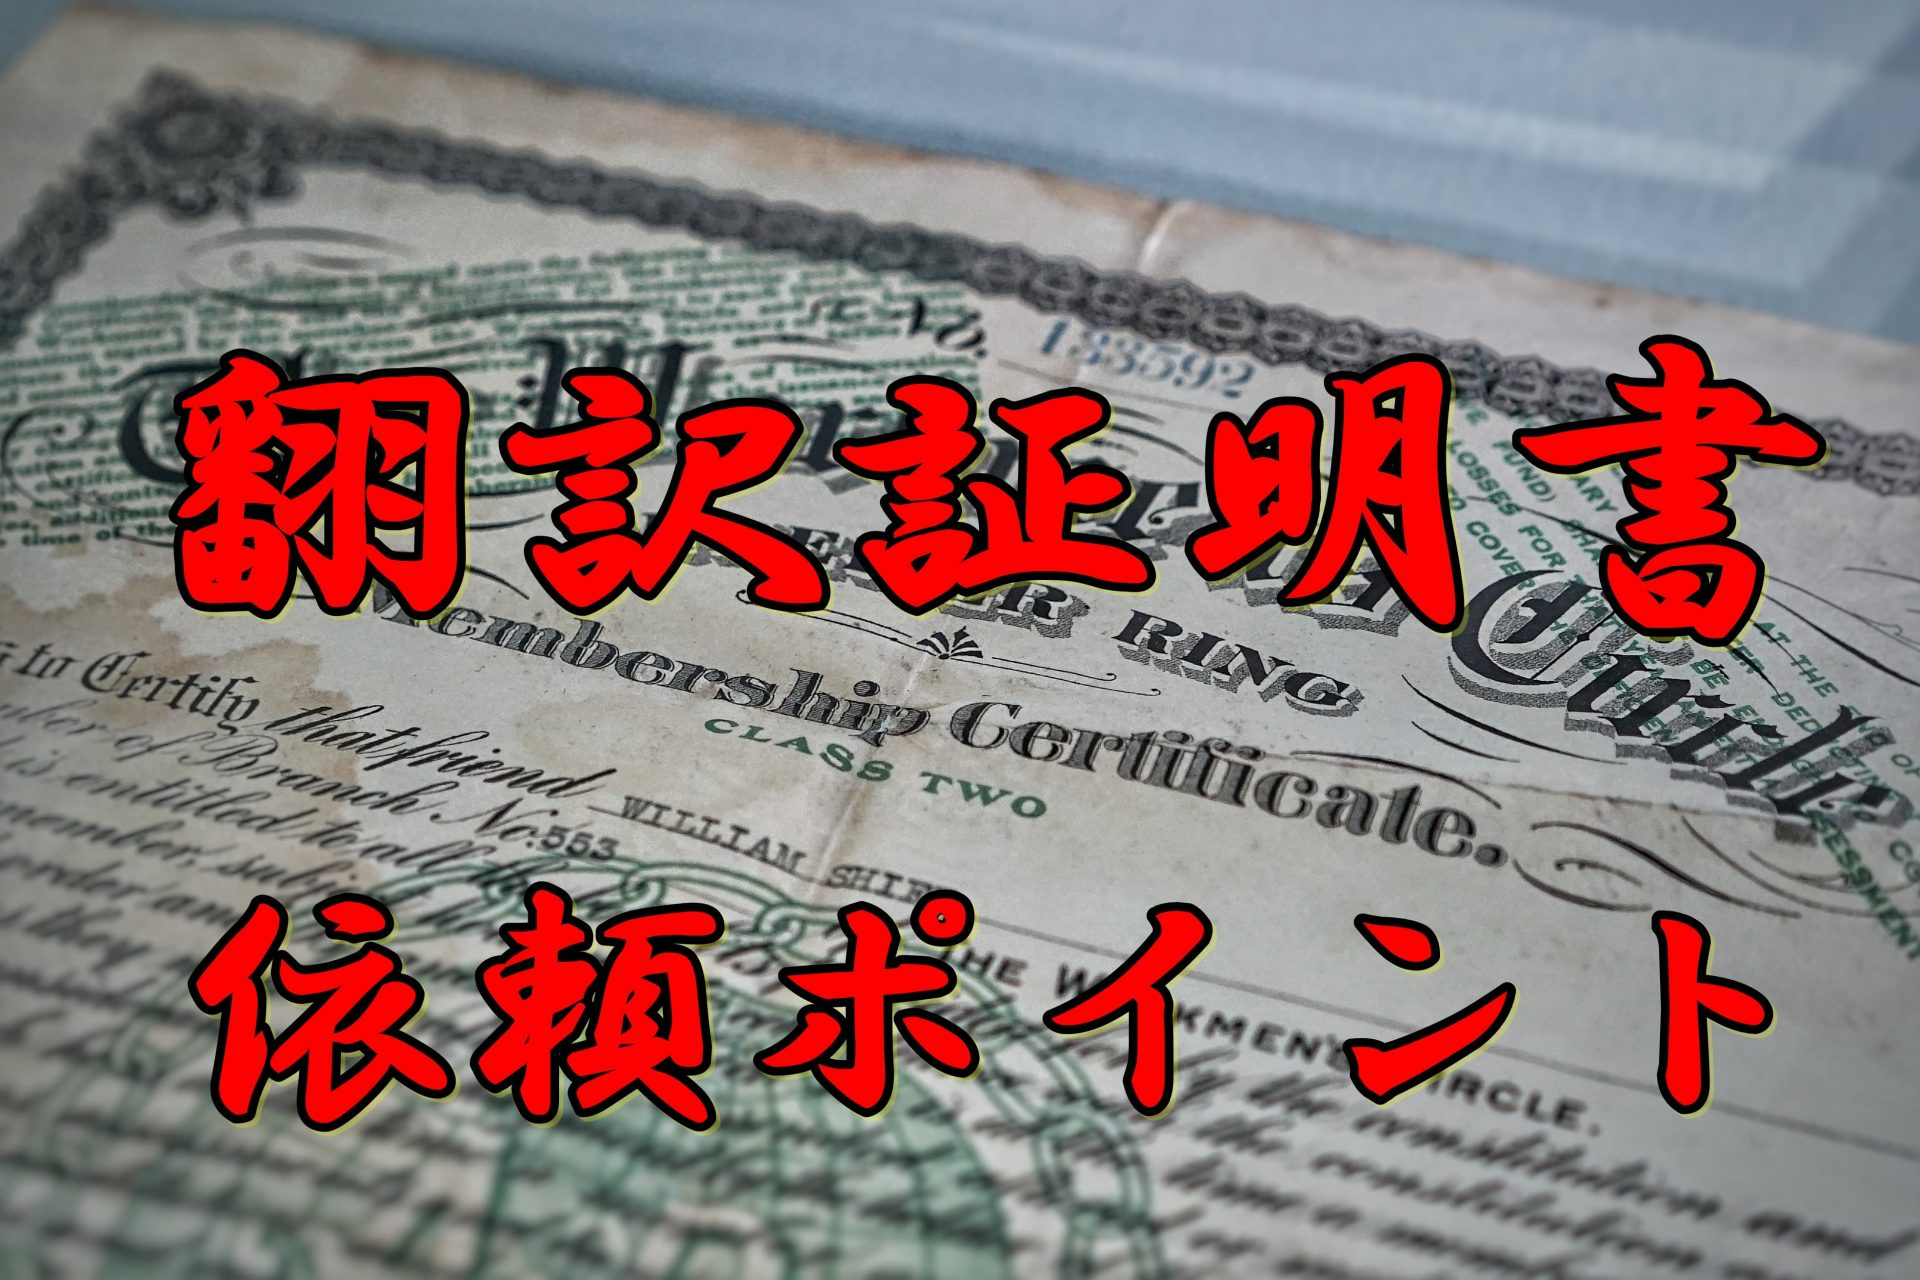 c2a700af4506fa0f5cd7153e1fdaf87e - 翻訳会社に翻訳証明書を発行してもらう必要があるケースとは?